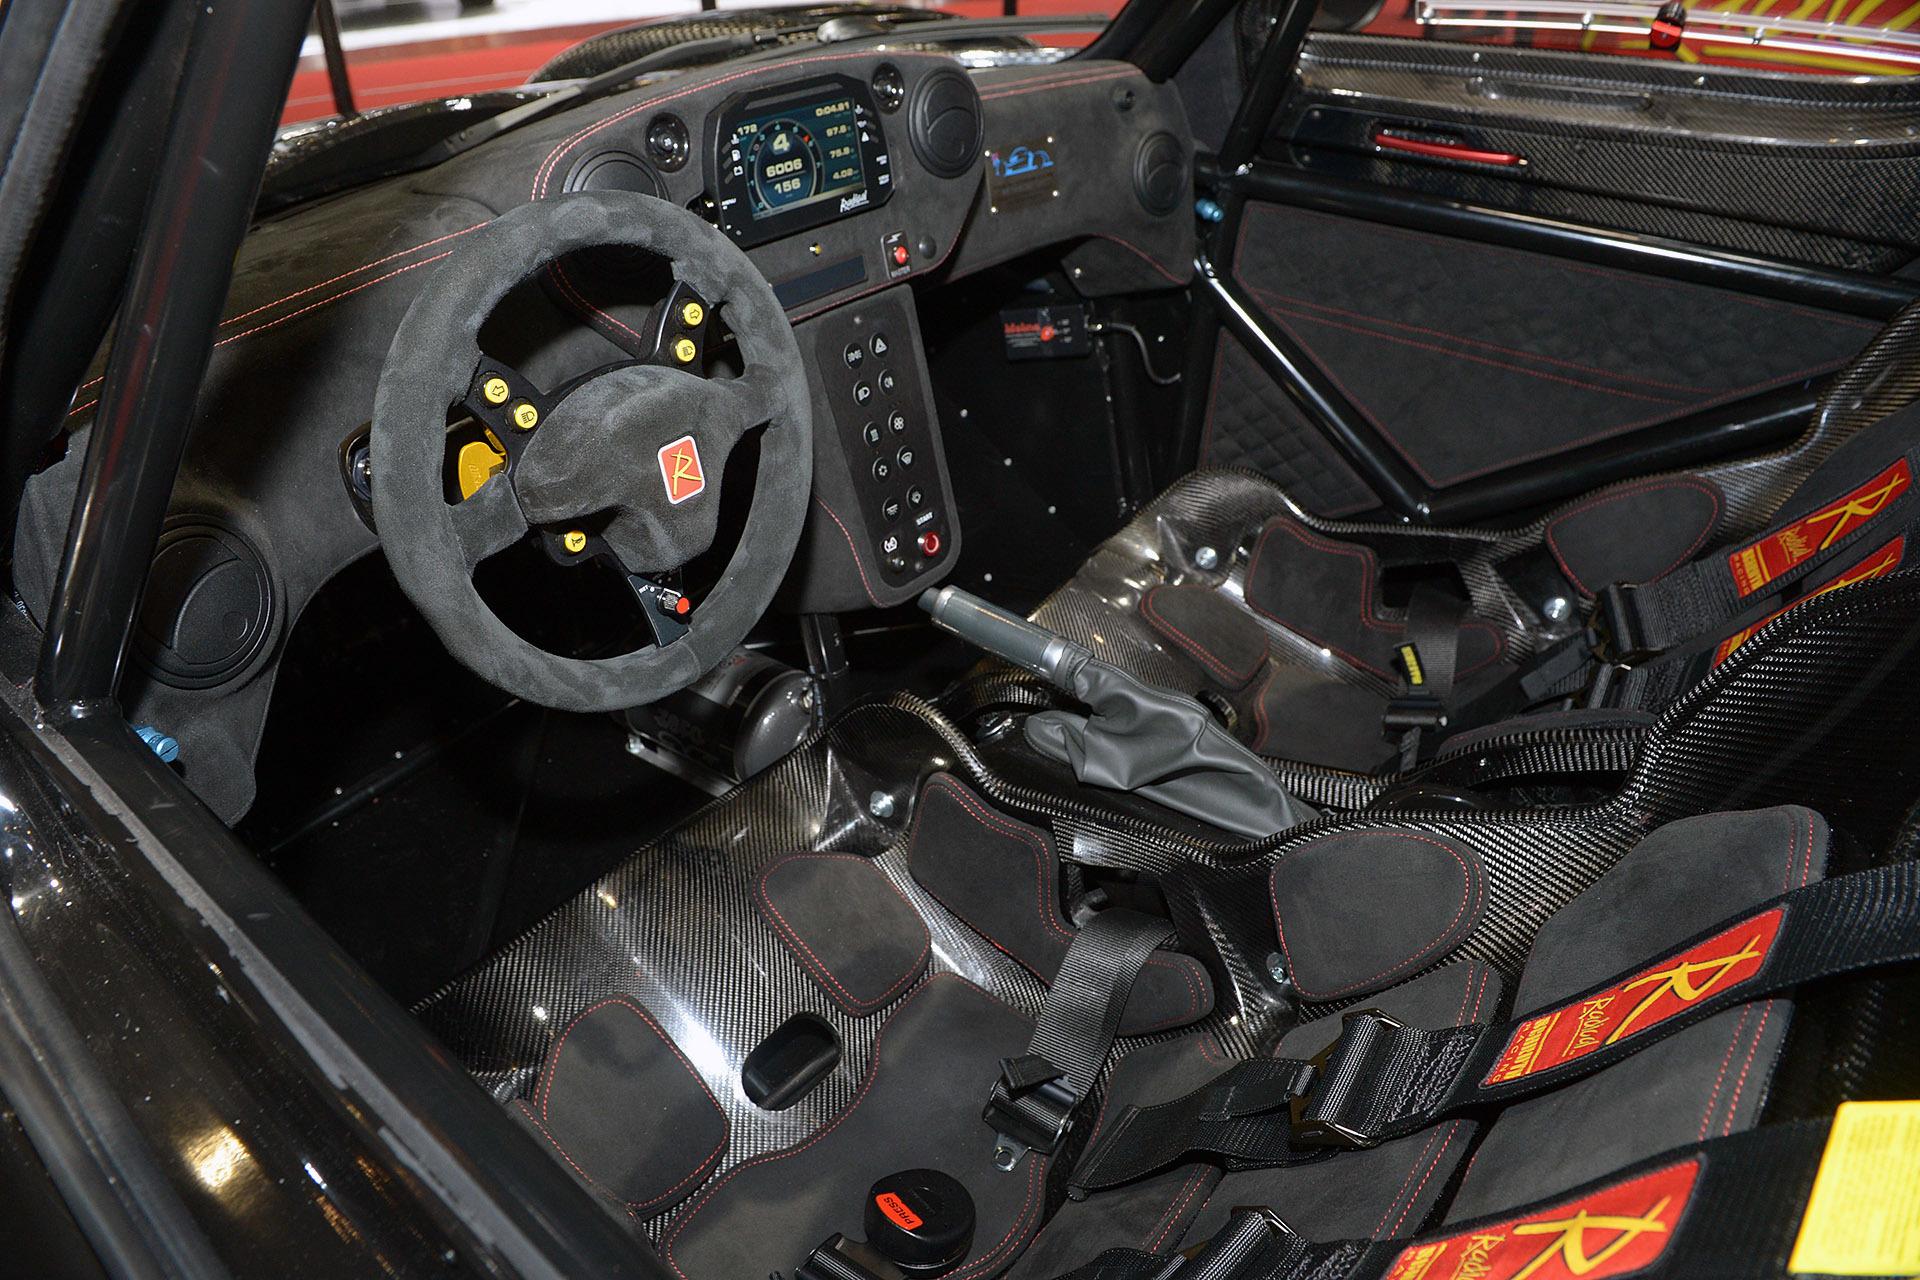 10-radical-rxc-turbo-500r-geneva-1-1.jpg